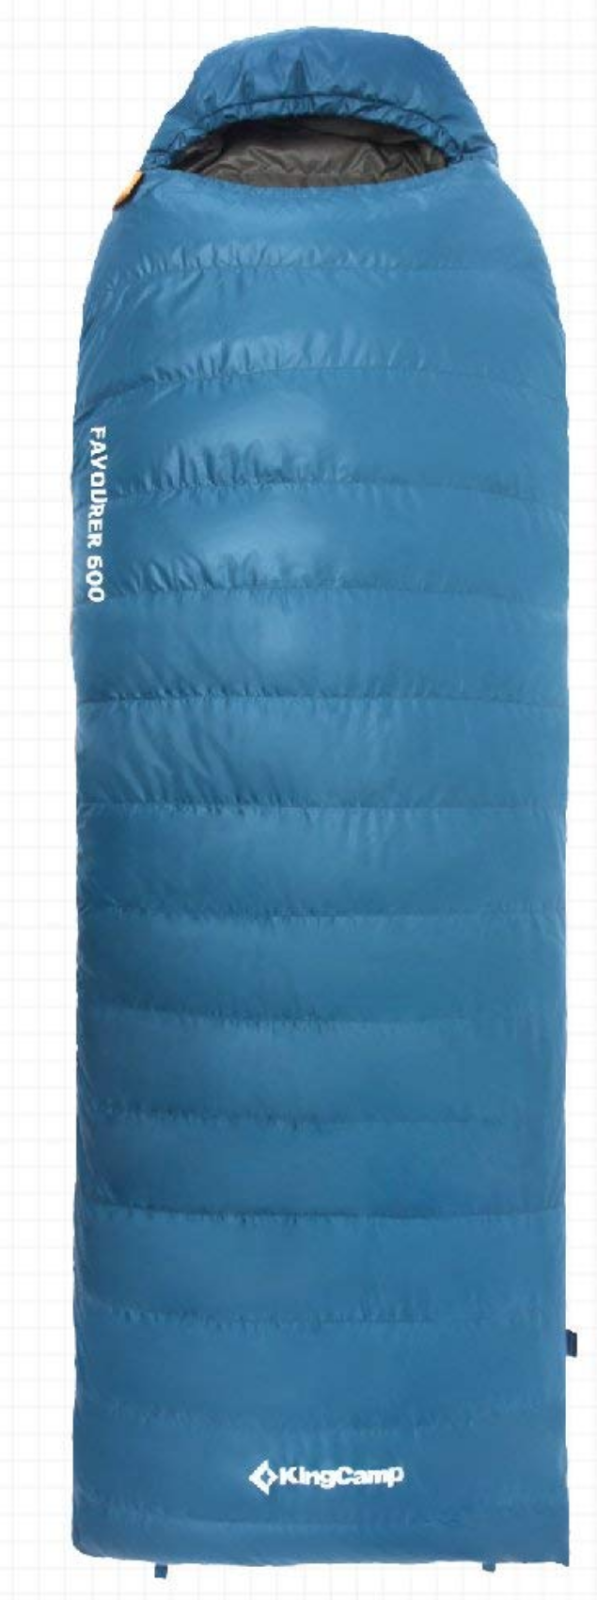 Down Sleeping borsa Hooded with Compression Sack nuovo blu